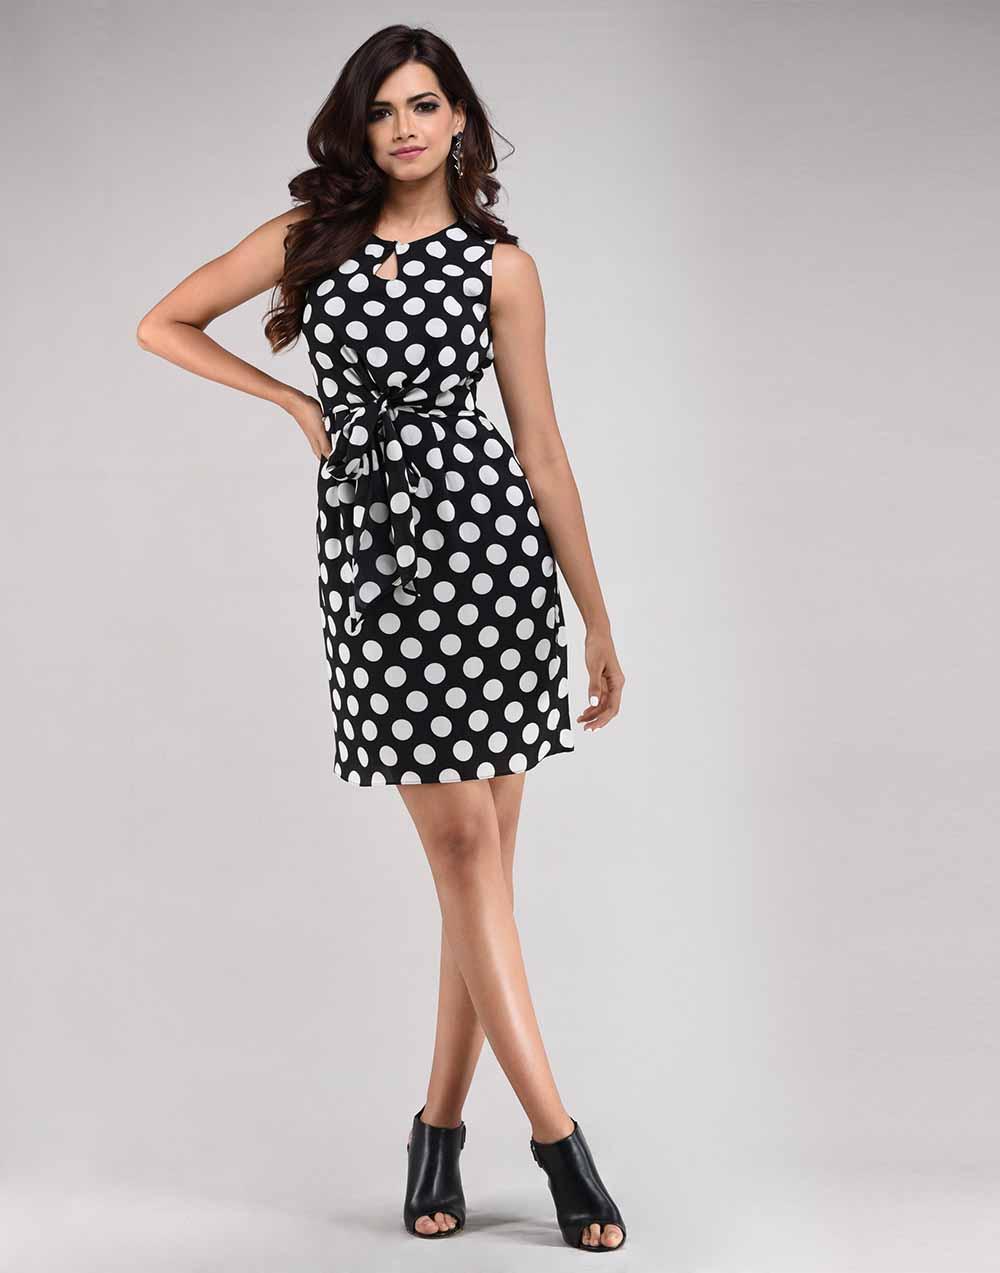 aac3f4397d28 Ladies Dress Online Uk